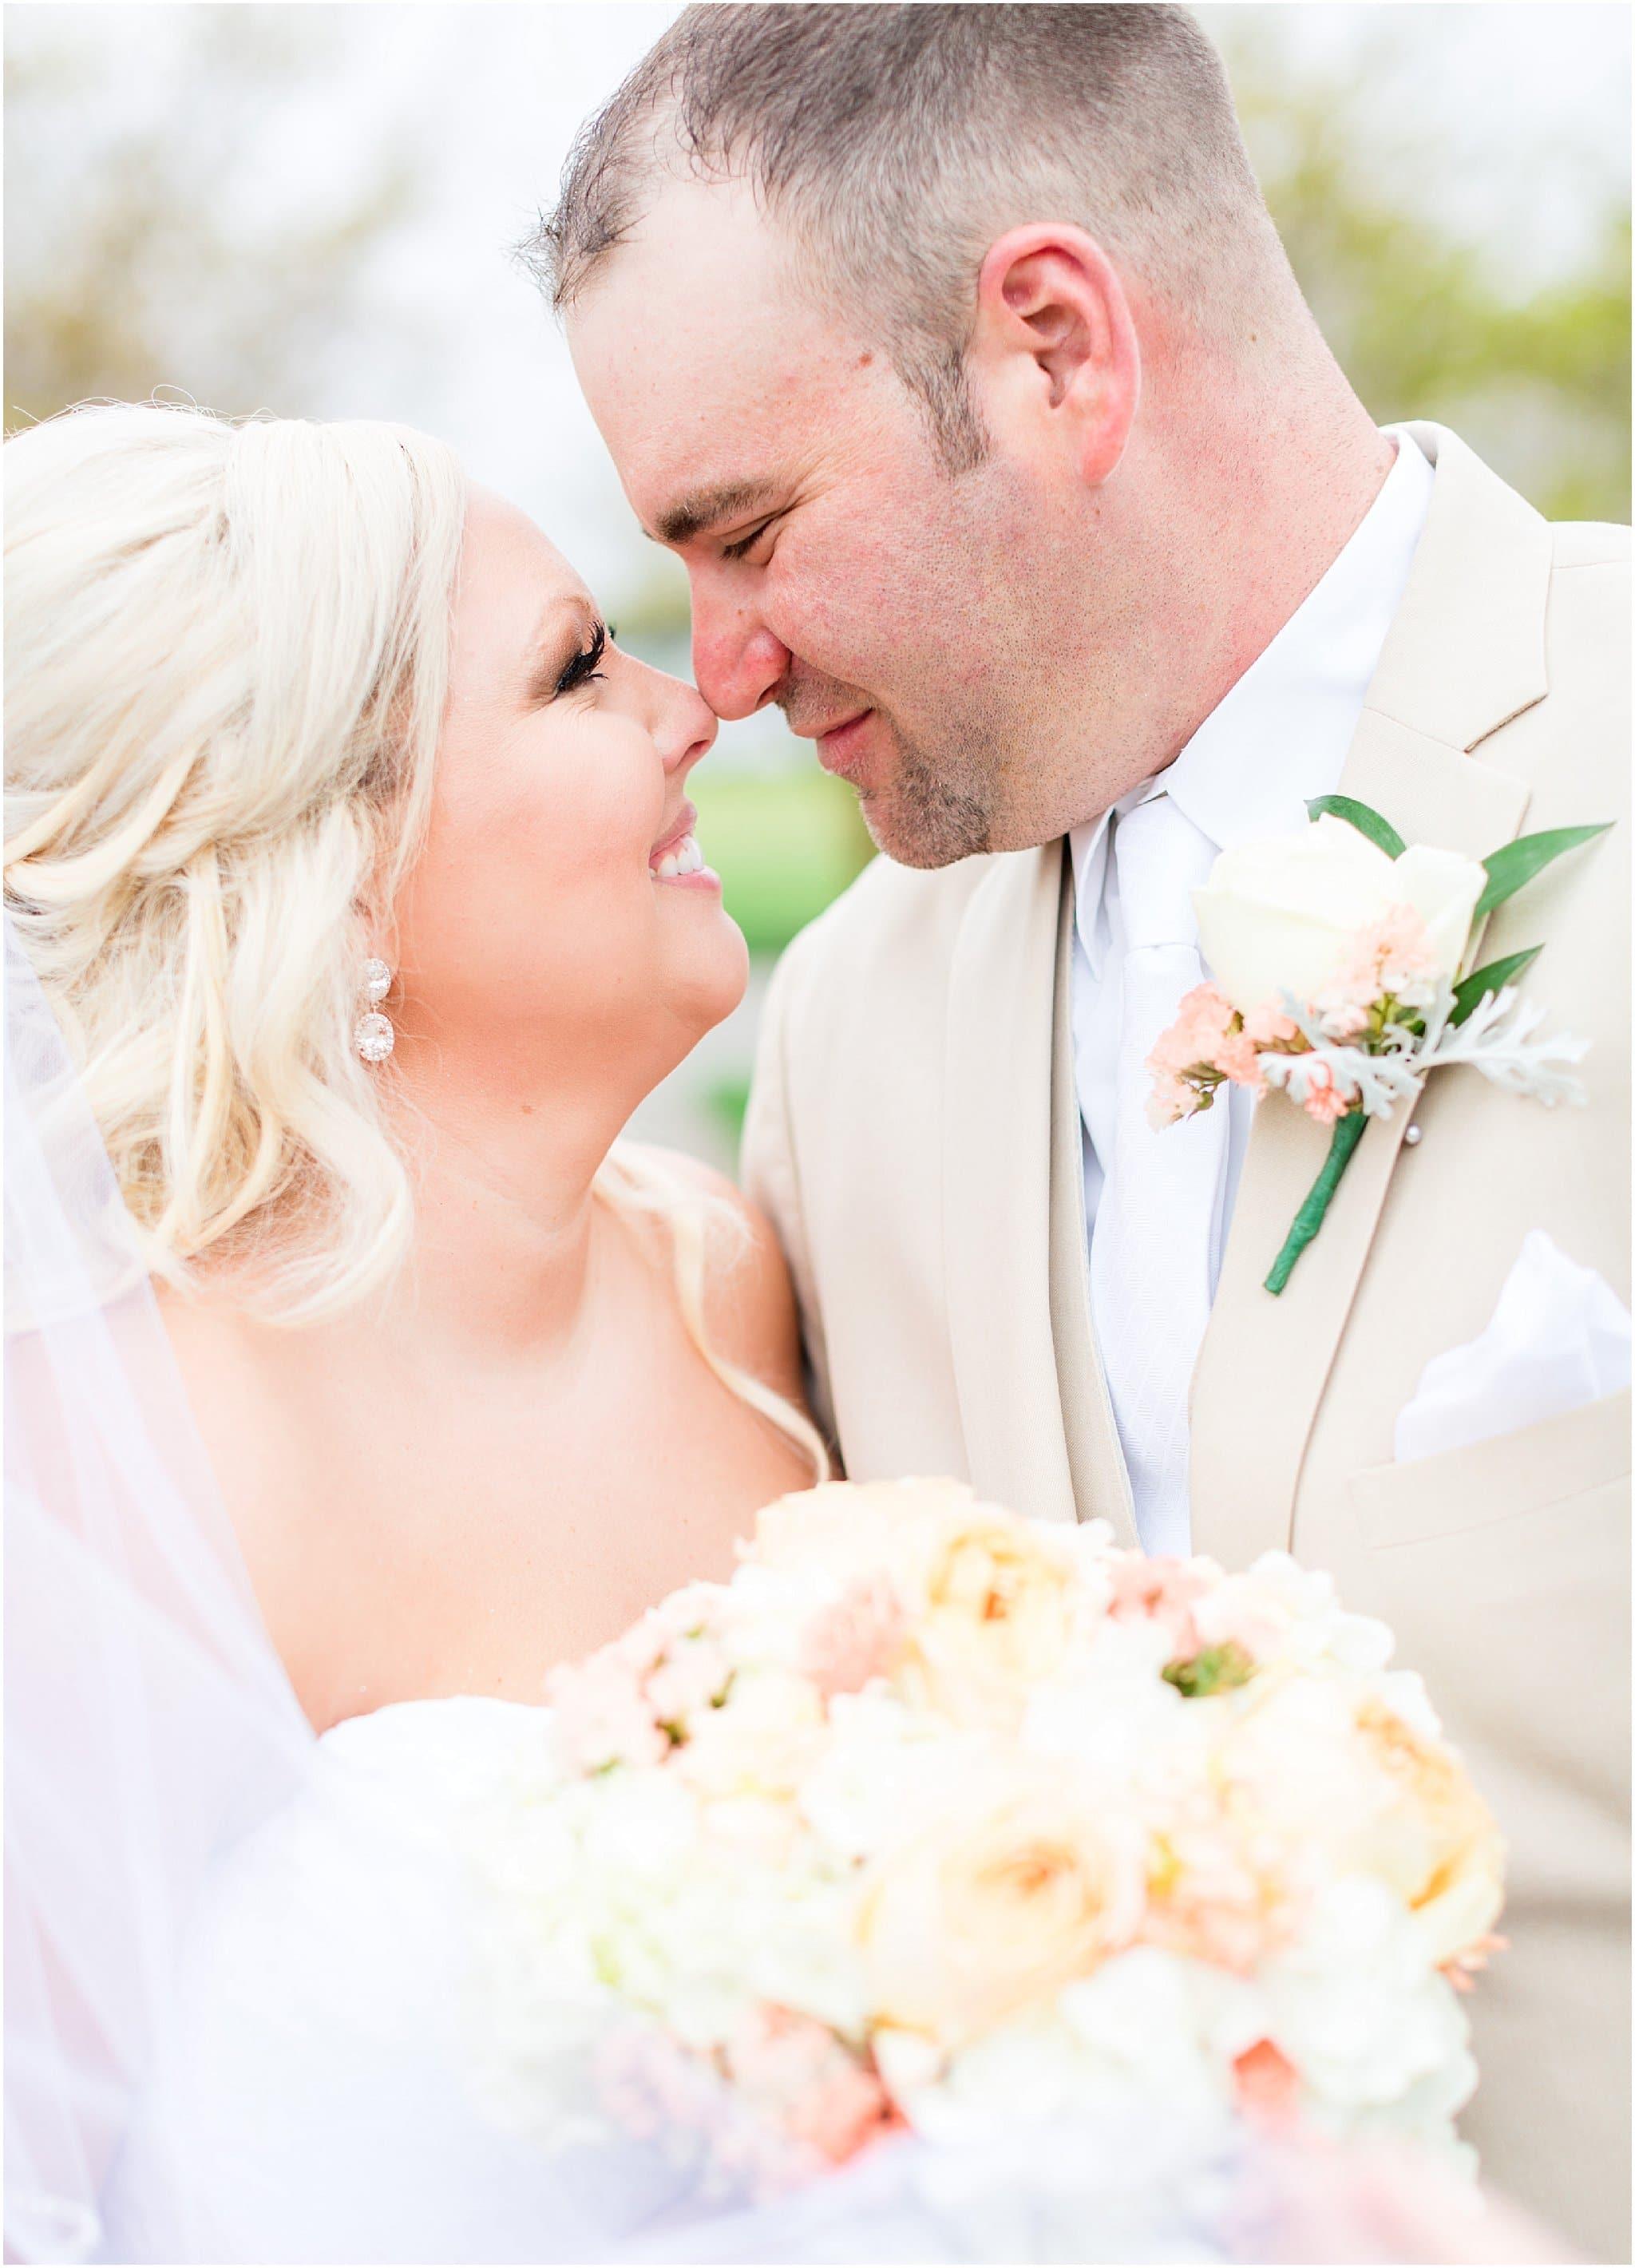 jessscott-milsboro-delaware-wedding-cassidymrphotography_0064